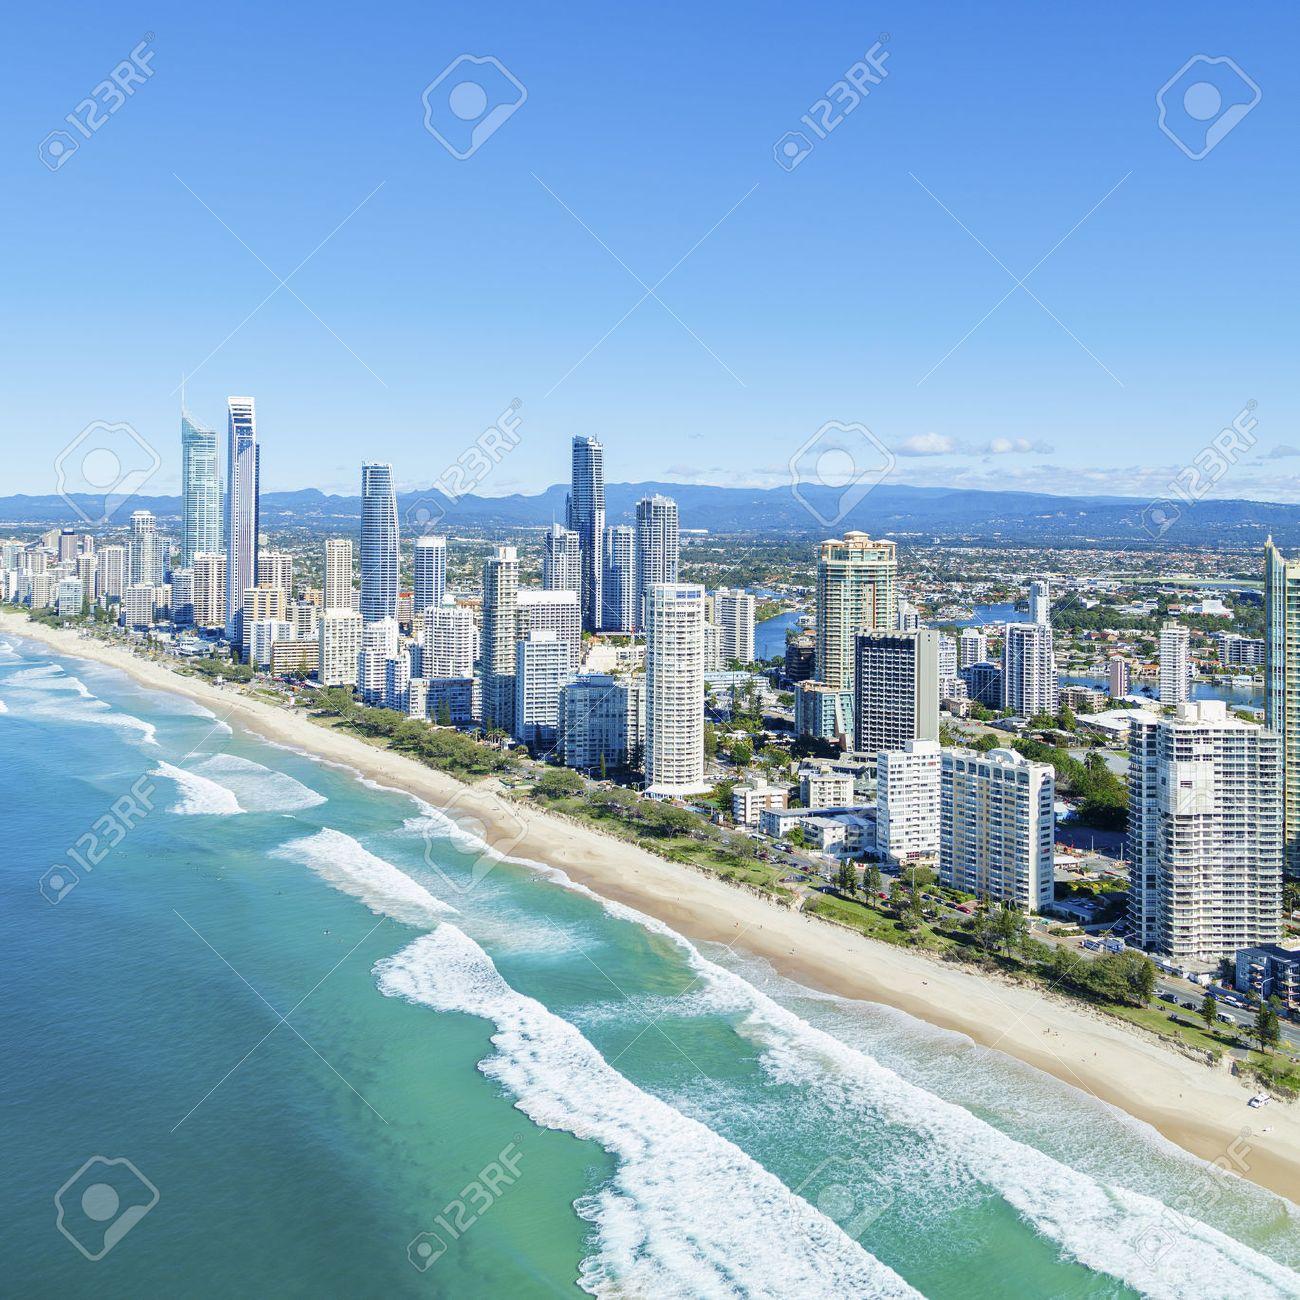 Sonnig Surfers Paradise an Queenslands Gold Coast. Standard-Bild - 37220927